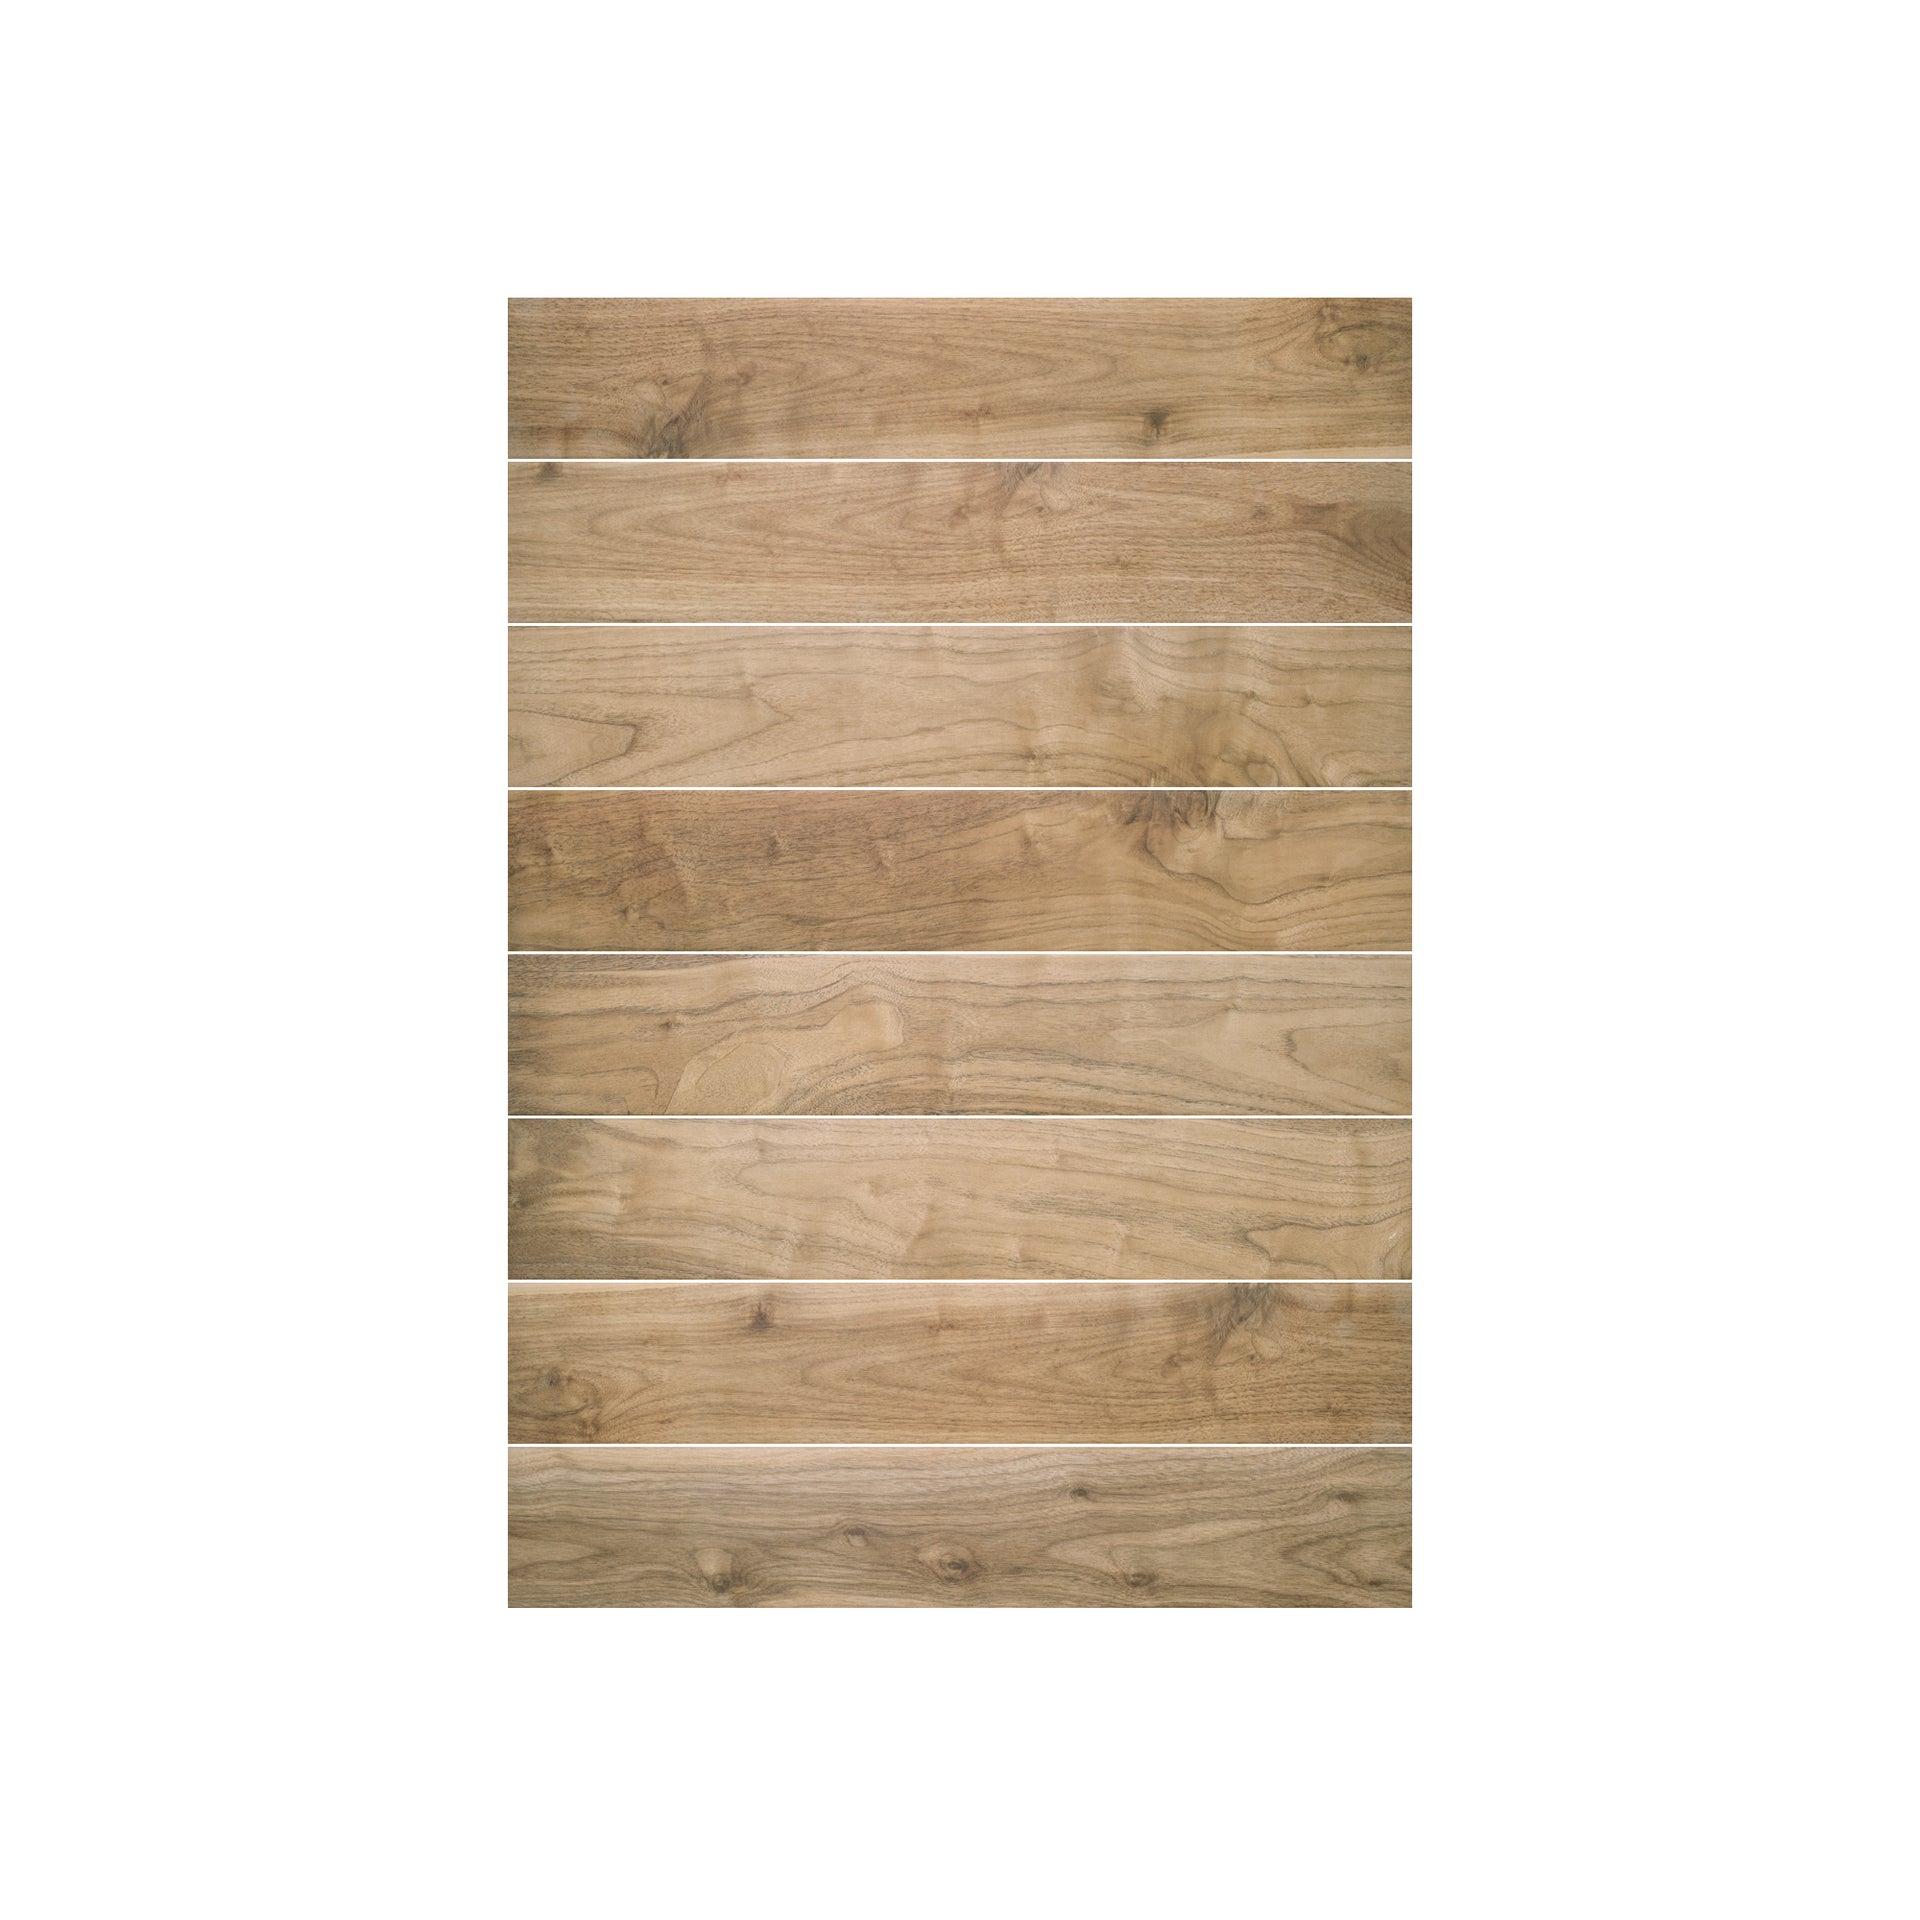 Carrelage sol et mur forte effet bois naturel Spania l.15 x L.90 cm